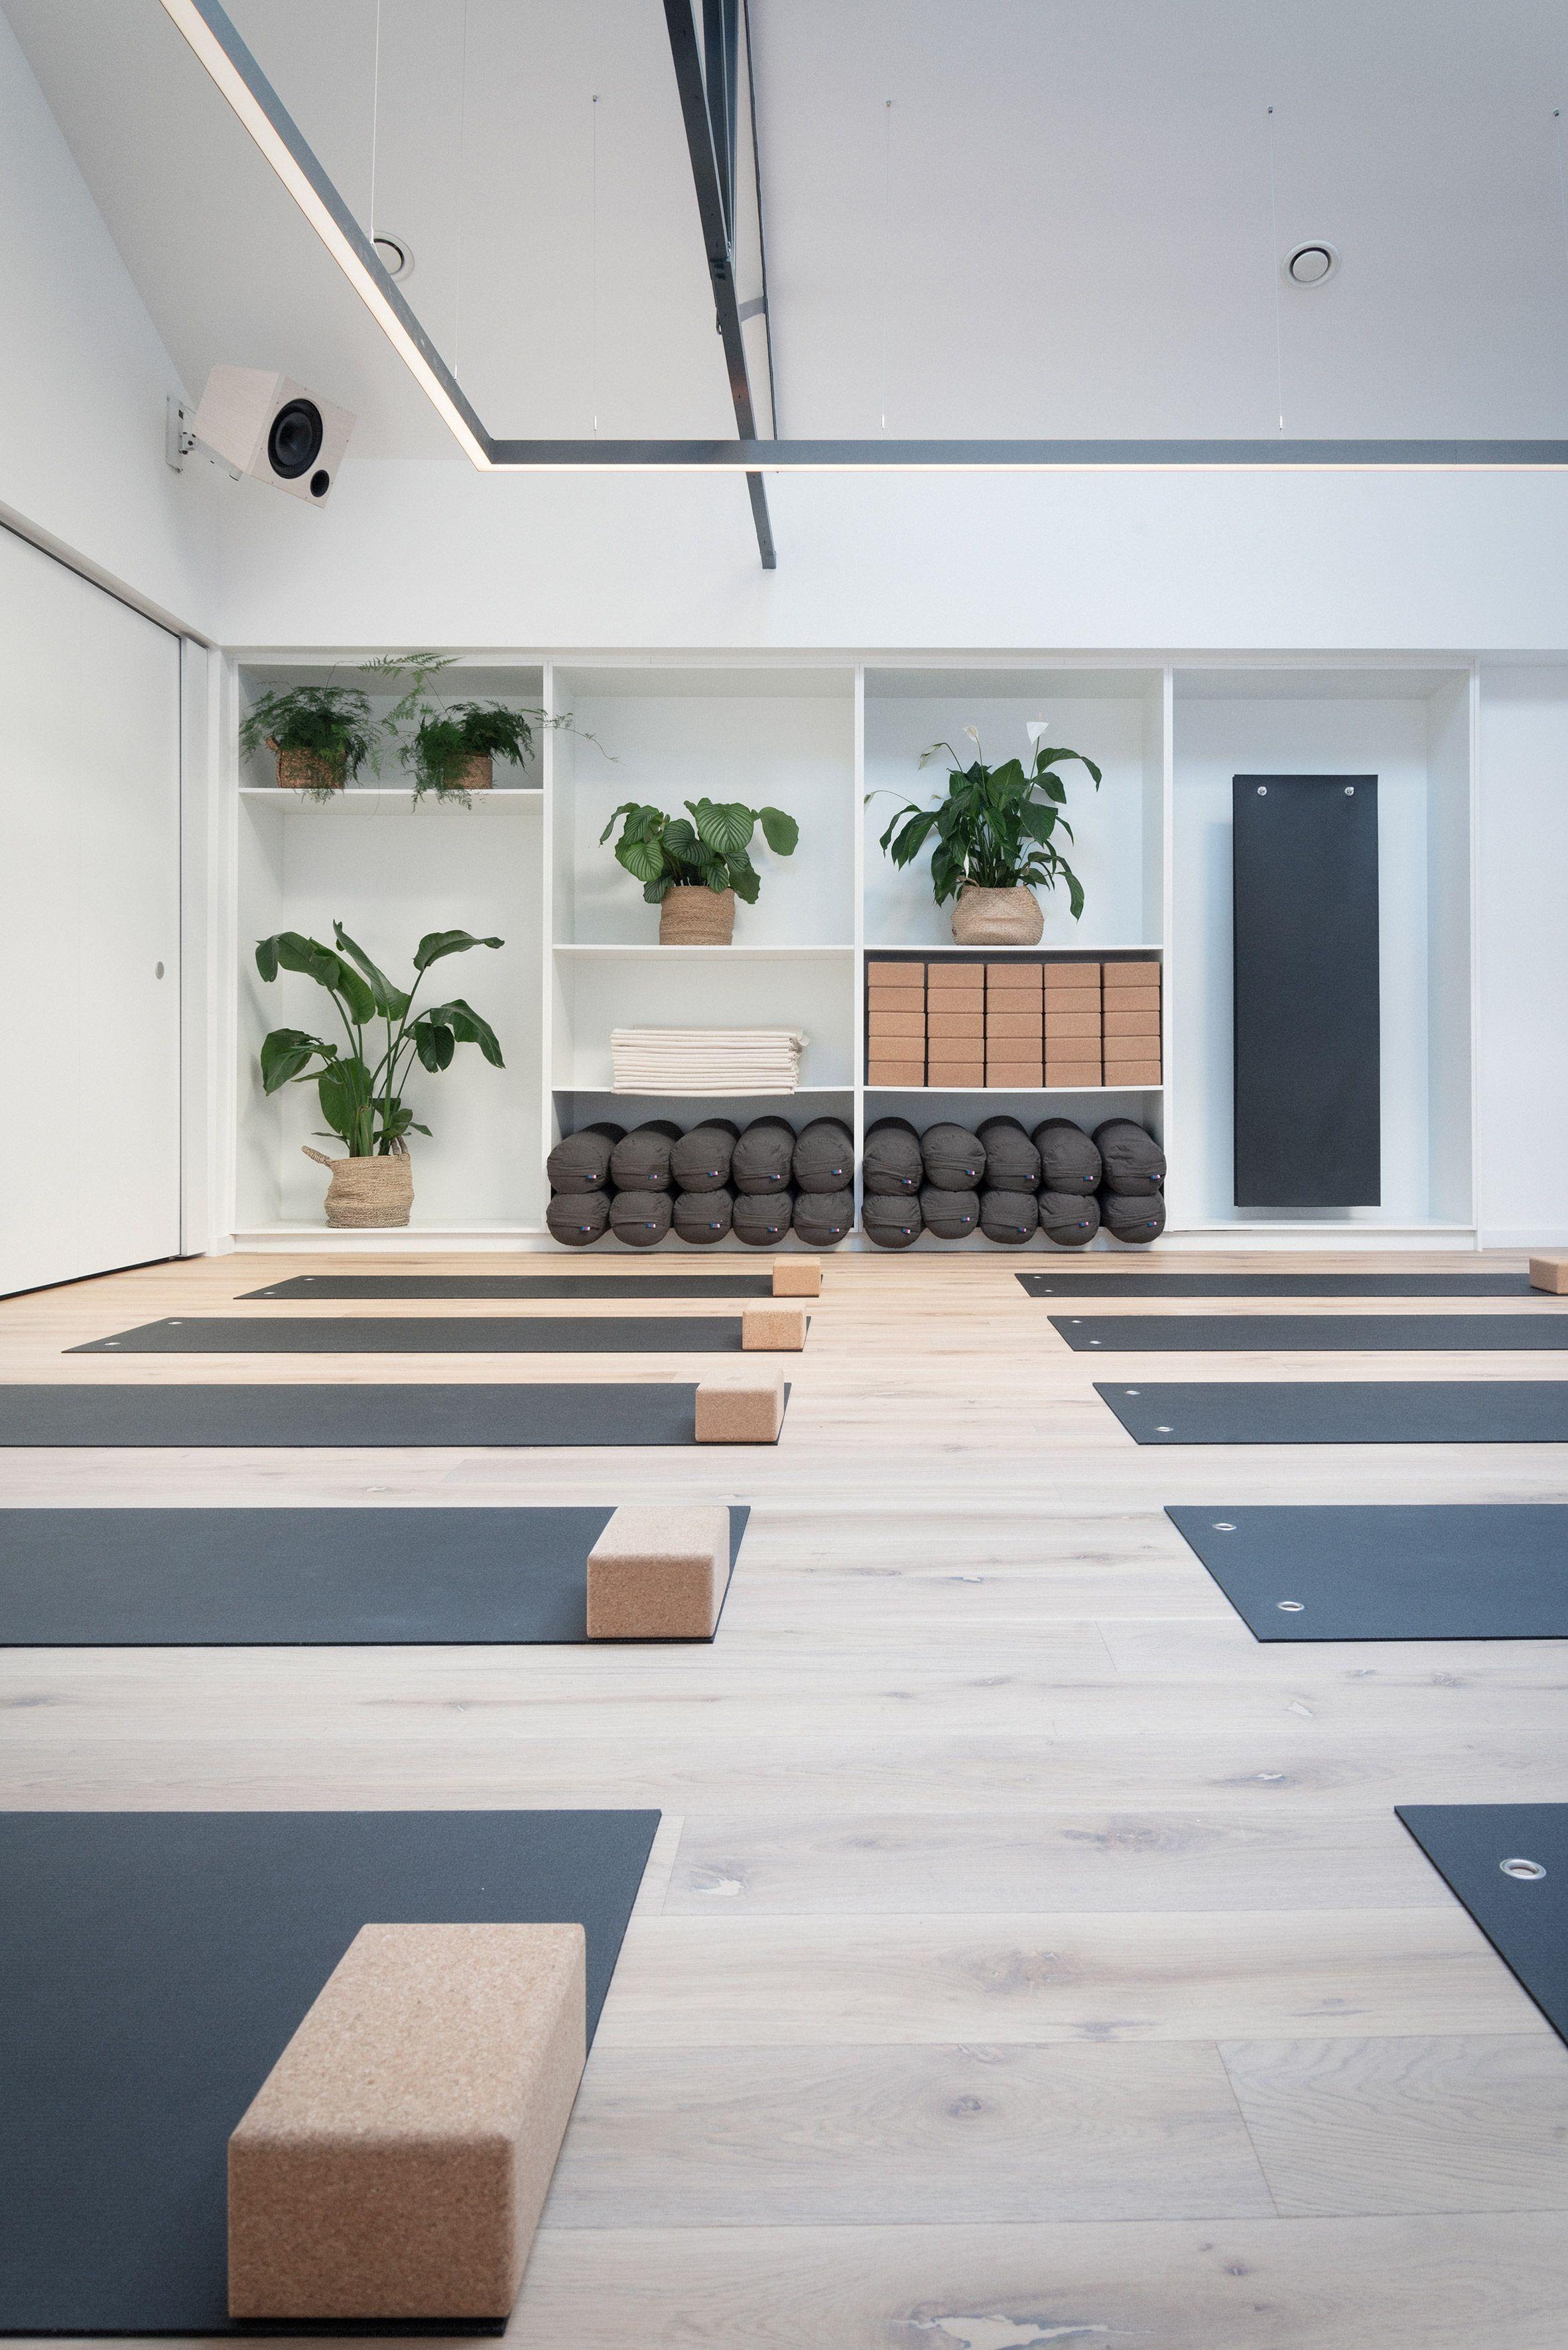 Yoga Poses Inspire Interiors Of Dublin S The Space Between In 2020 Yoga Studio Design Yoga Room Design Home Yoga Room